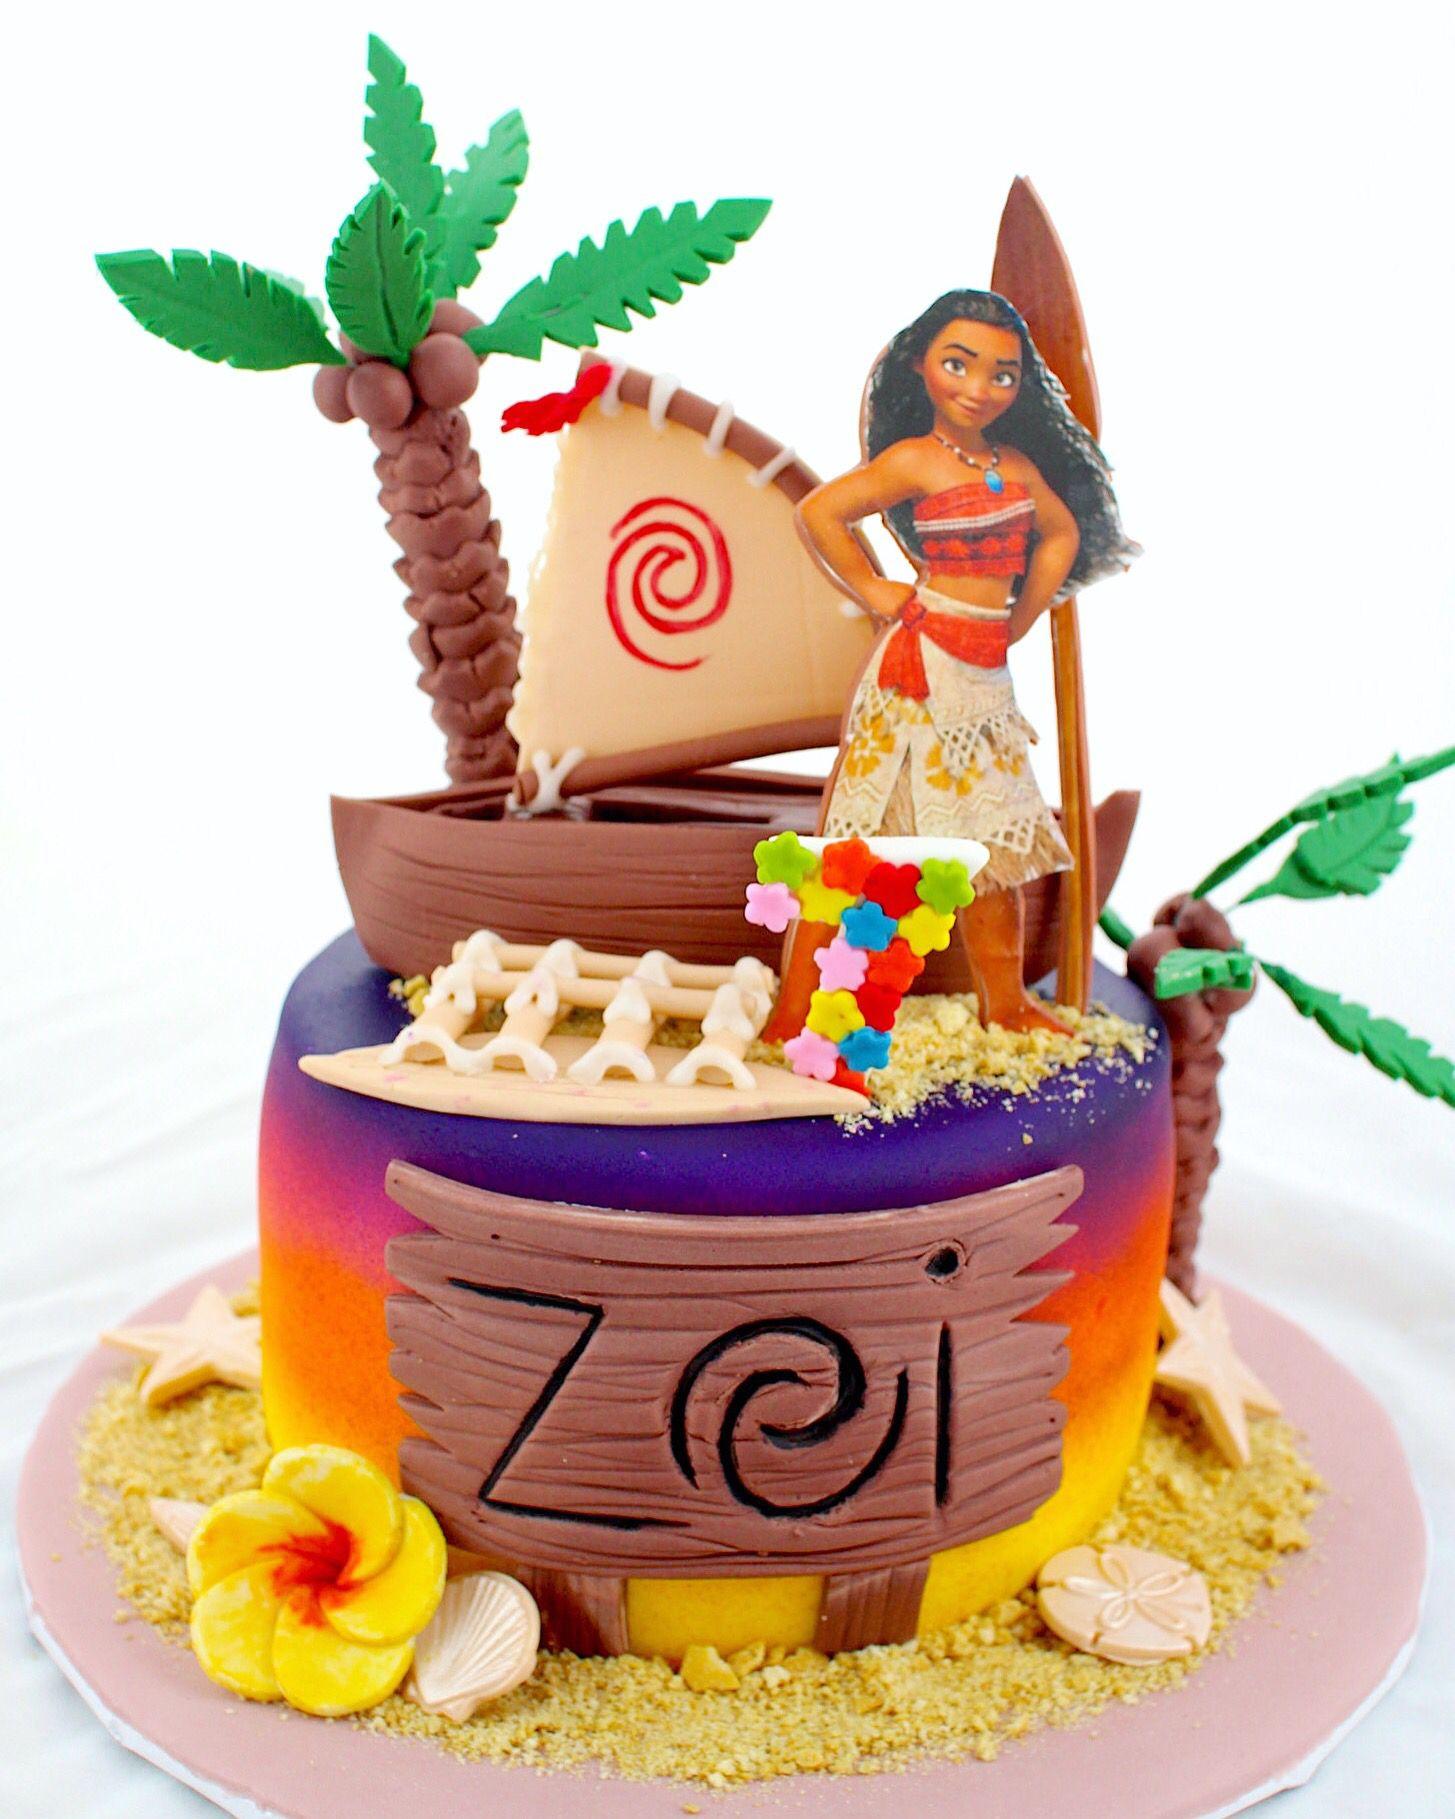 Cake Design Moana : MOANA CAKE DONE BY CAKE BASH STUDIO AND BAKERY SHERMAN ...